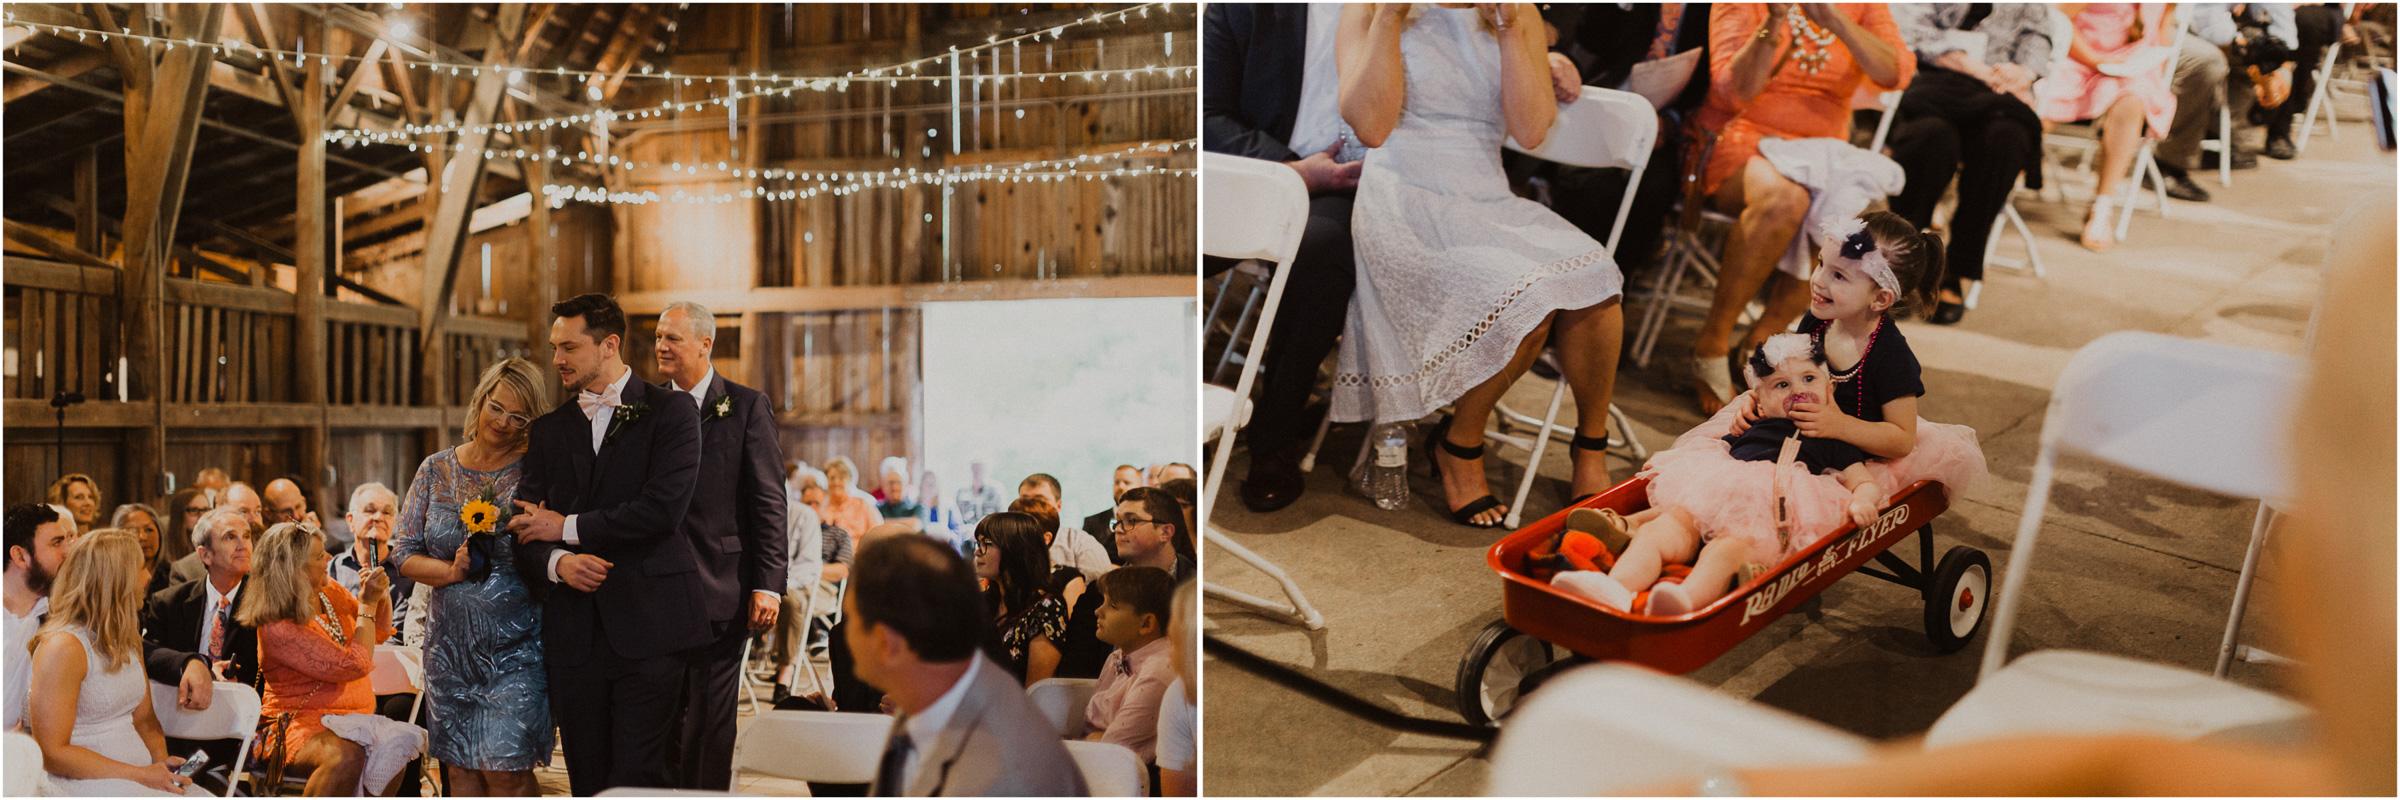 alyssa barletter photography nelson wedding nebraska city lied lodge morton barn spring wedding photographer-32.jpg